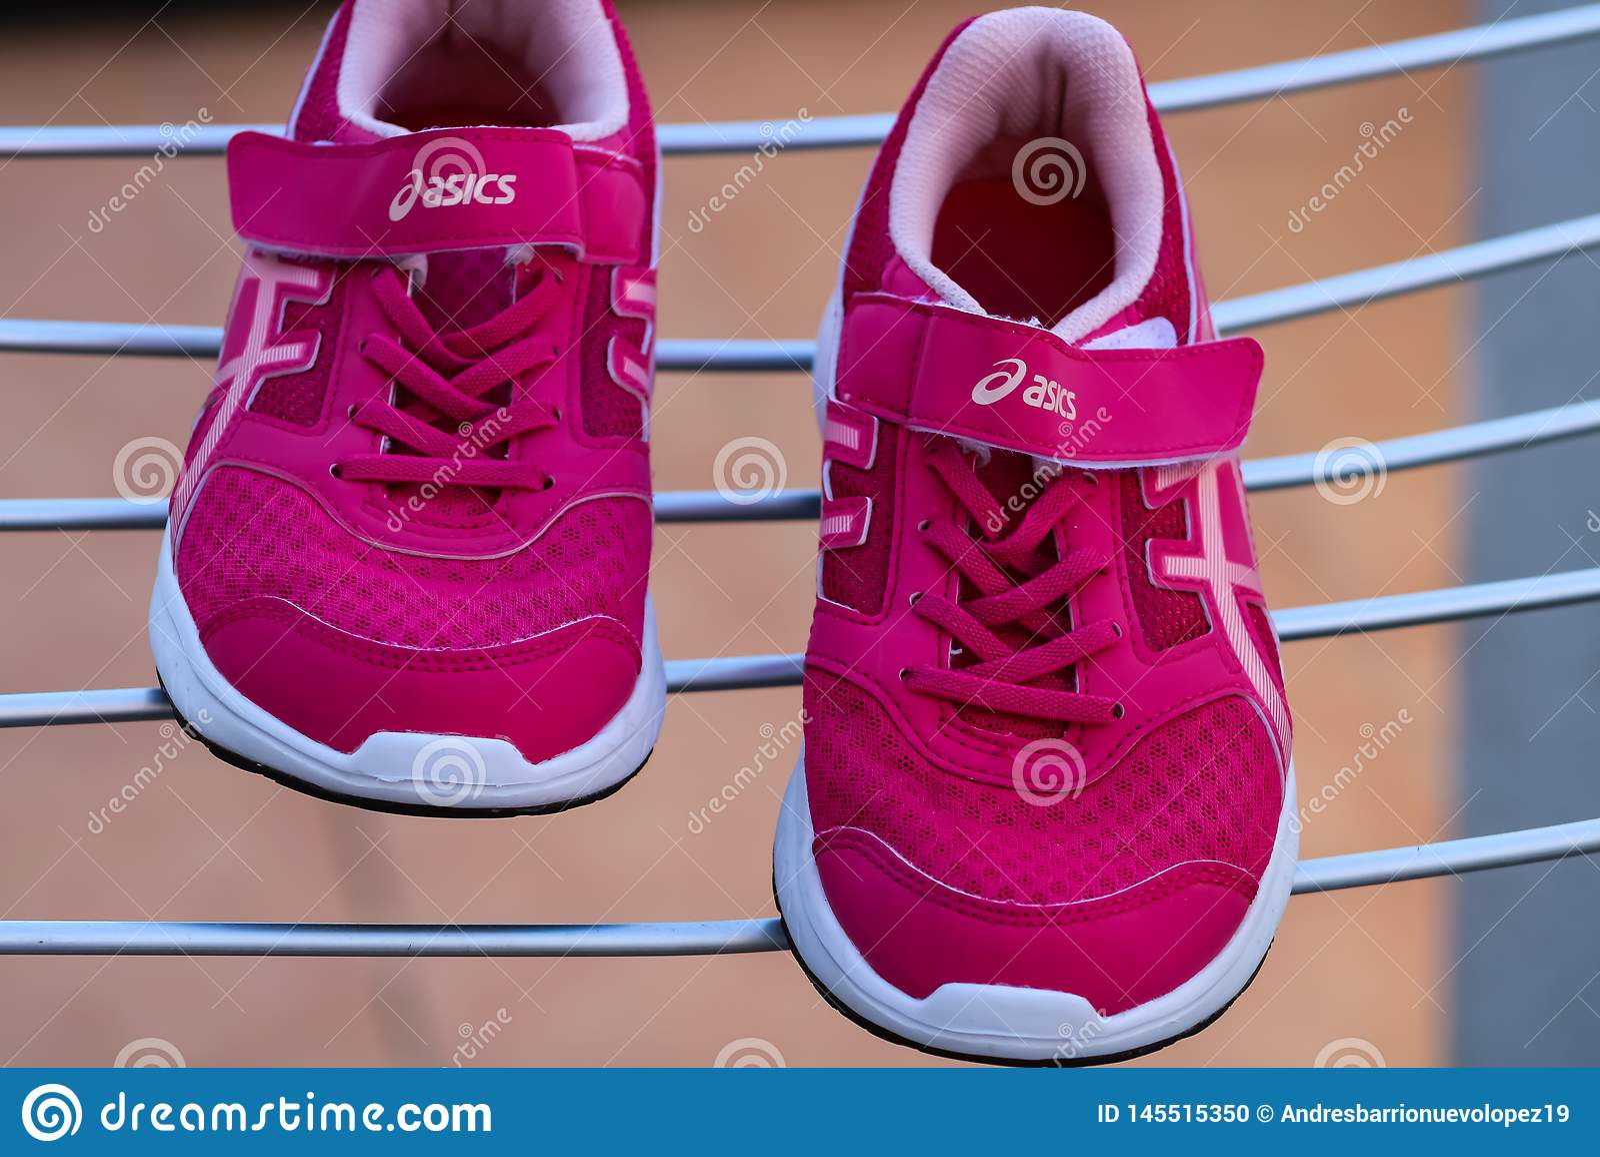 cada Permanentemente Sentimiento de culpa  Burriana, Spain 03/02/19:Pink Sneakers Asics Editorial Image - Image of  equipment, retro: 145515350